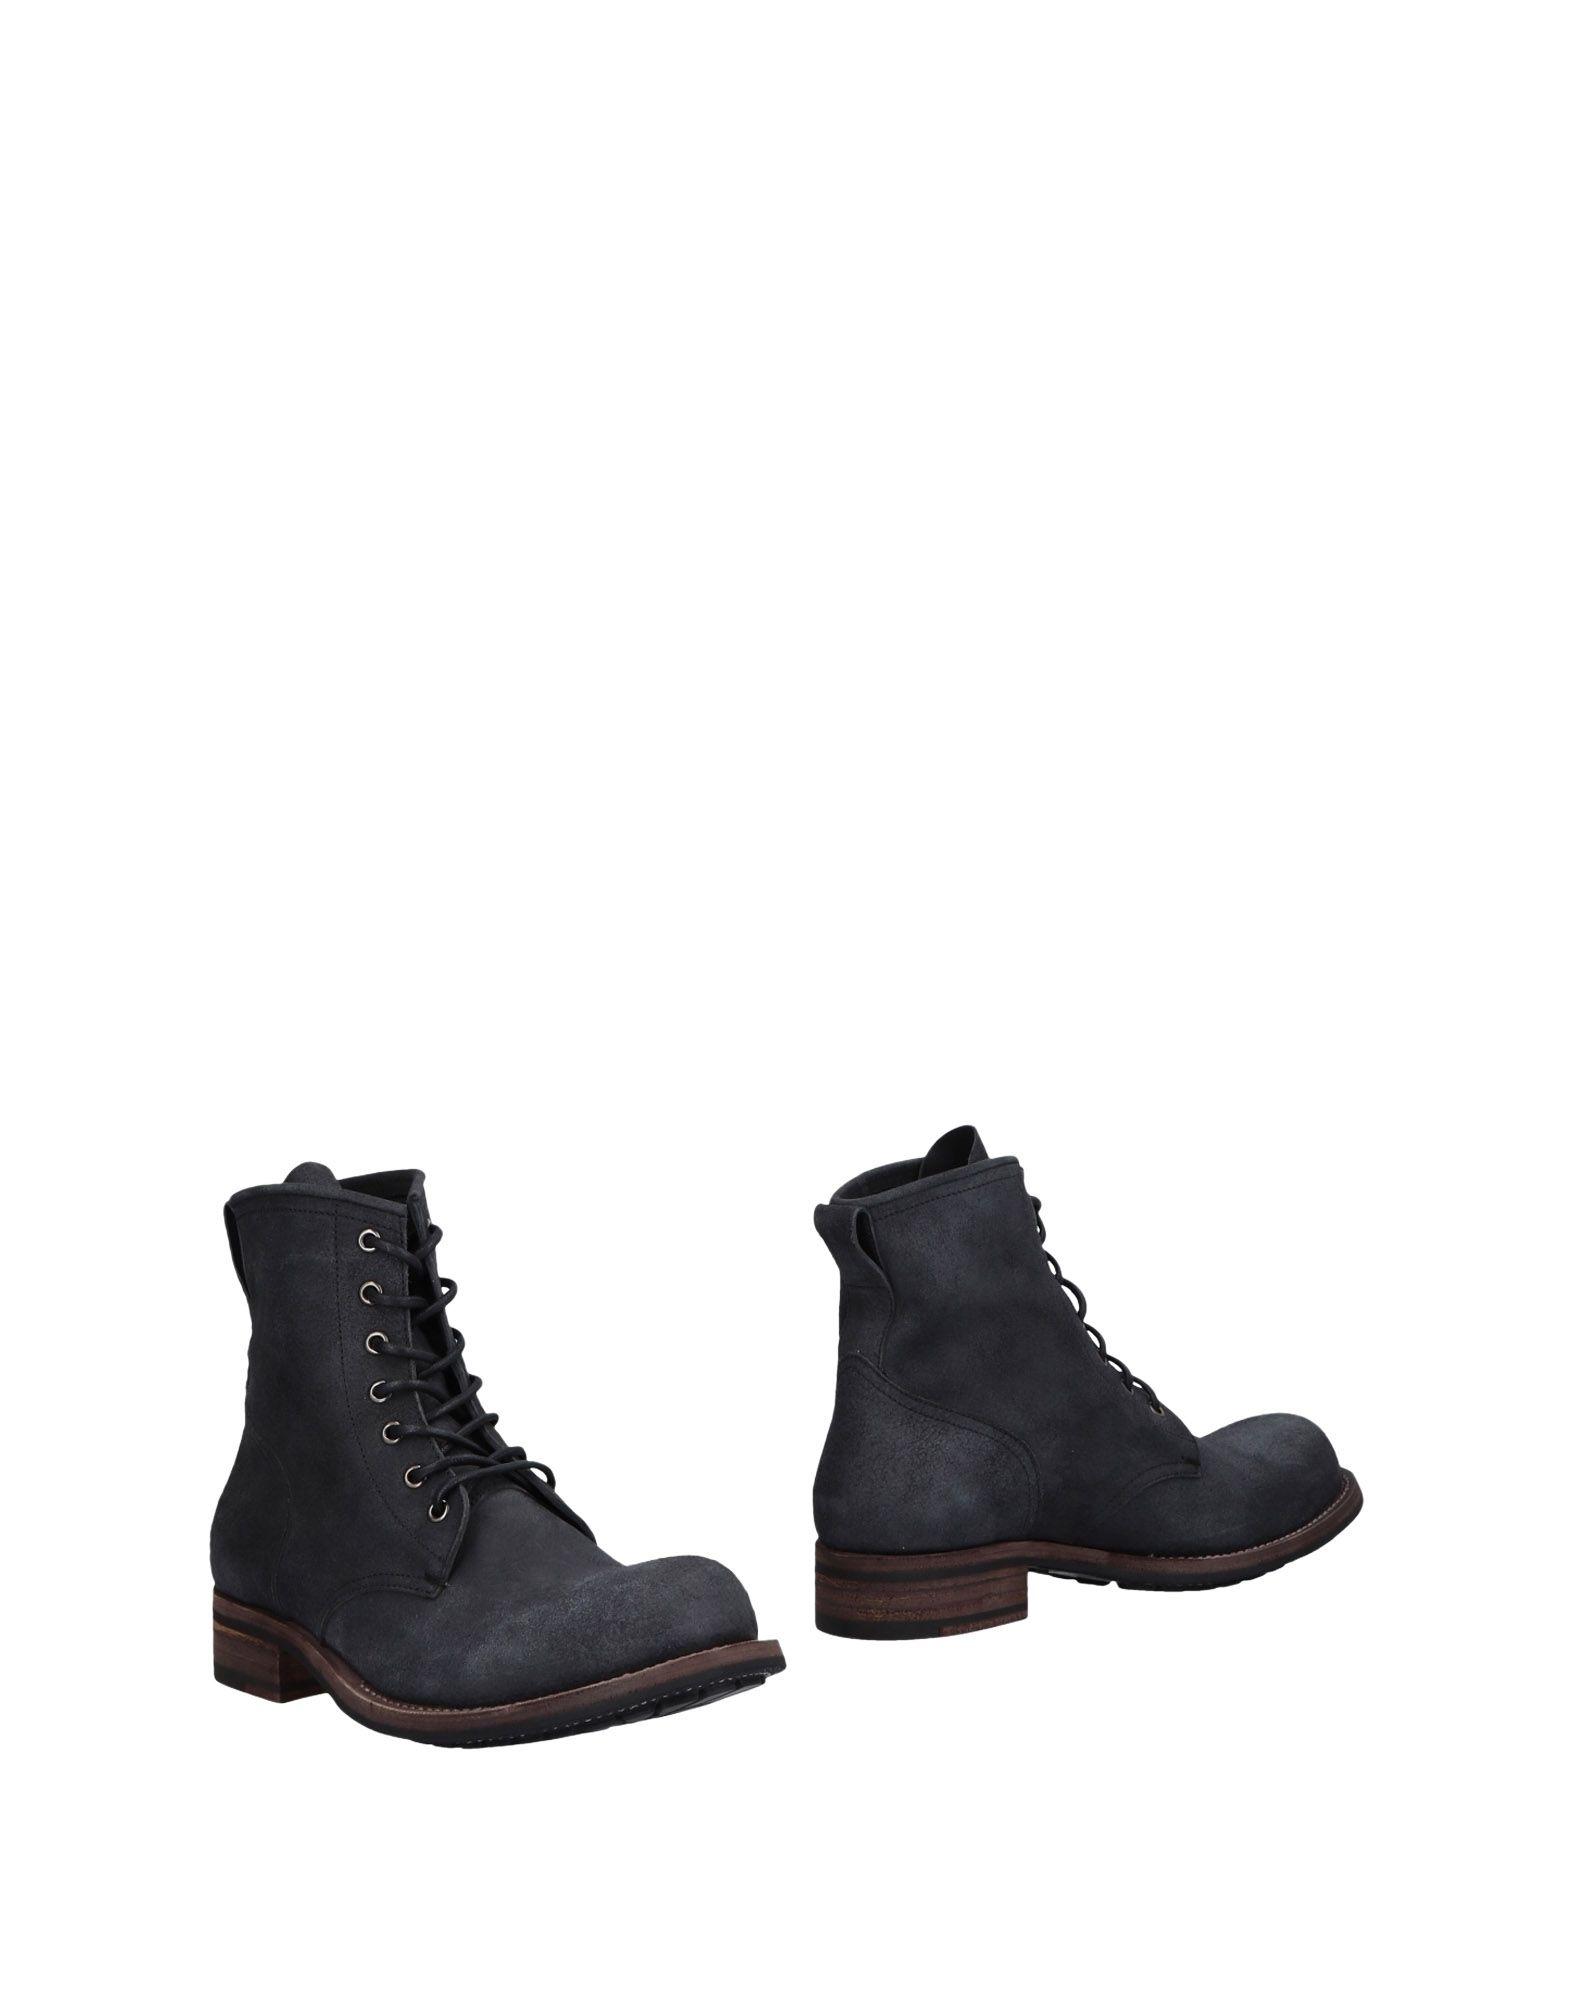 VIBRAM Boots in Steel Grey